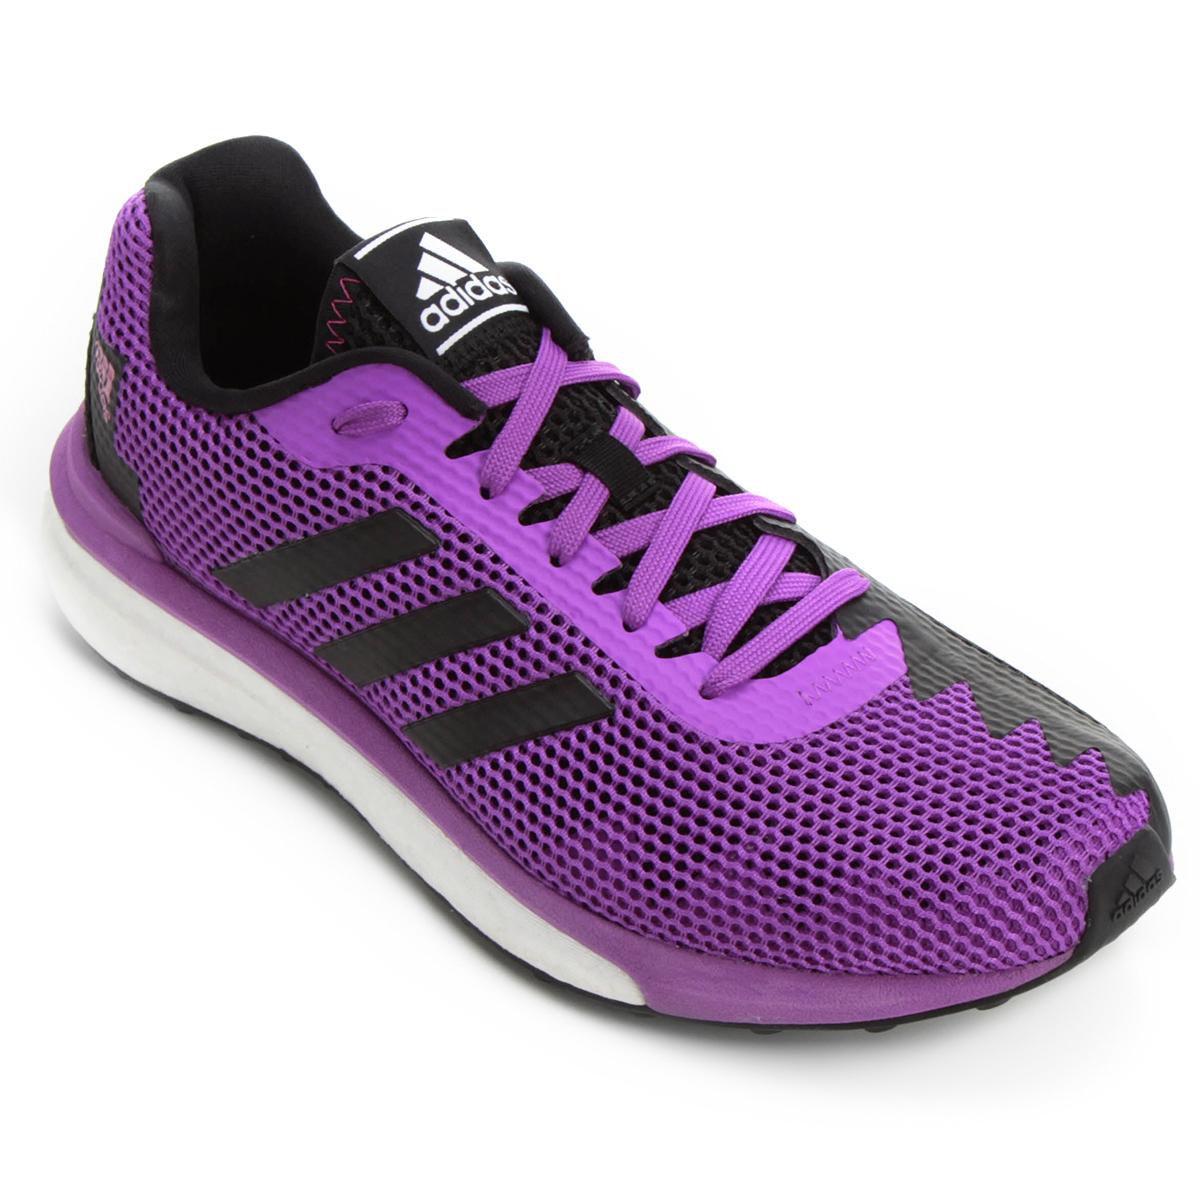 Tênis Feminino Adidas Vengeful w Tecnologia Boost